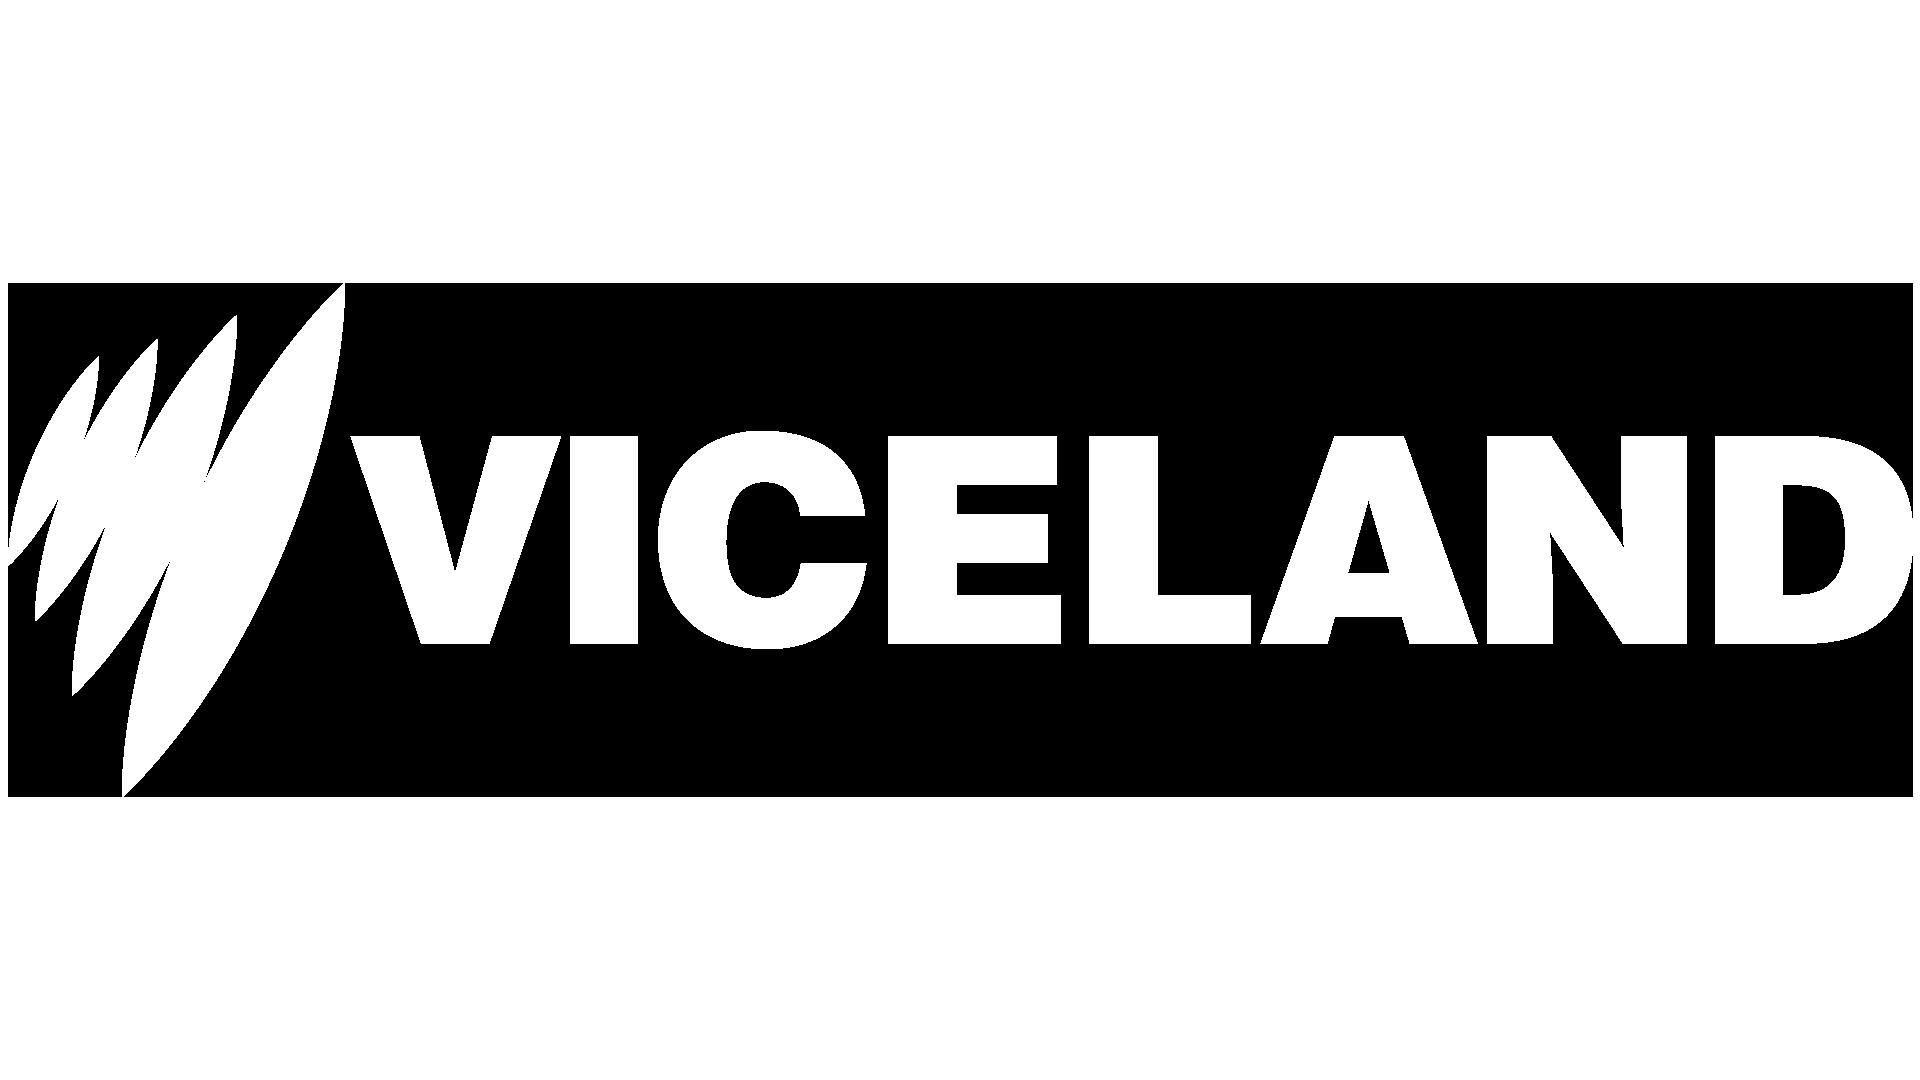 Sbs viceland logo png » PNG Image.